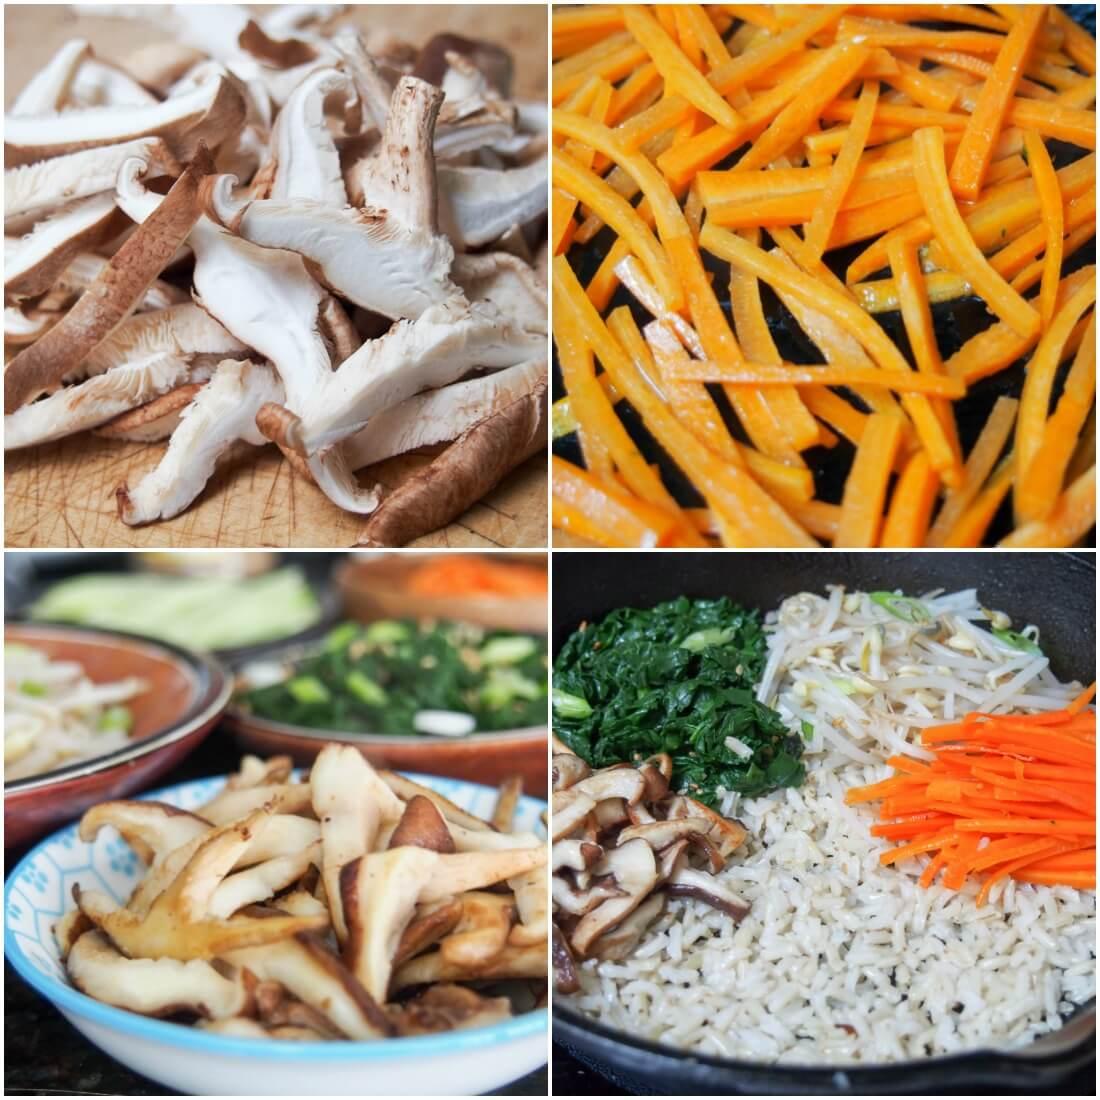 making vegetarian bibimbap - preparing vegetables and cooking in skillet